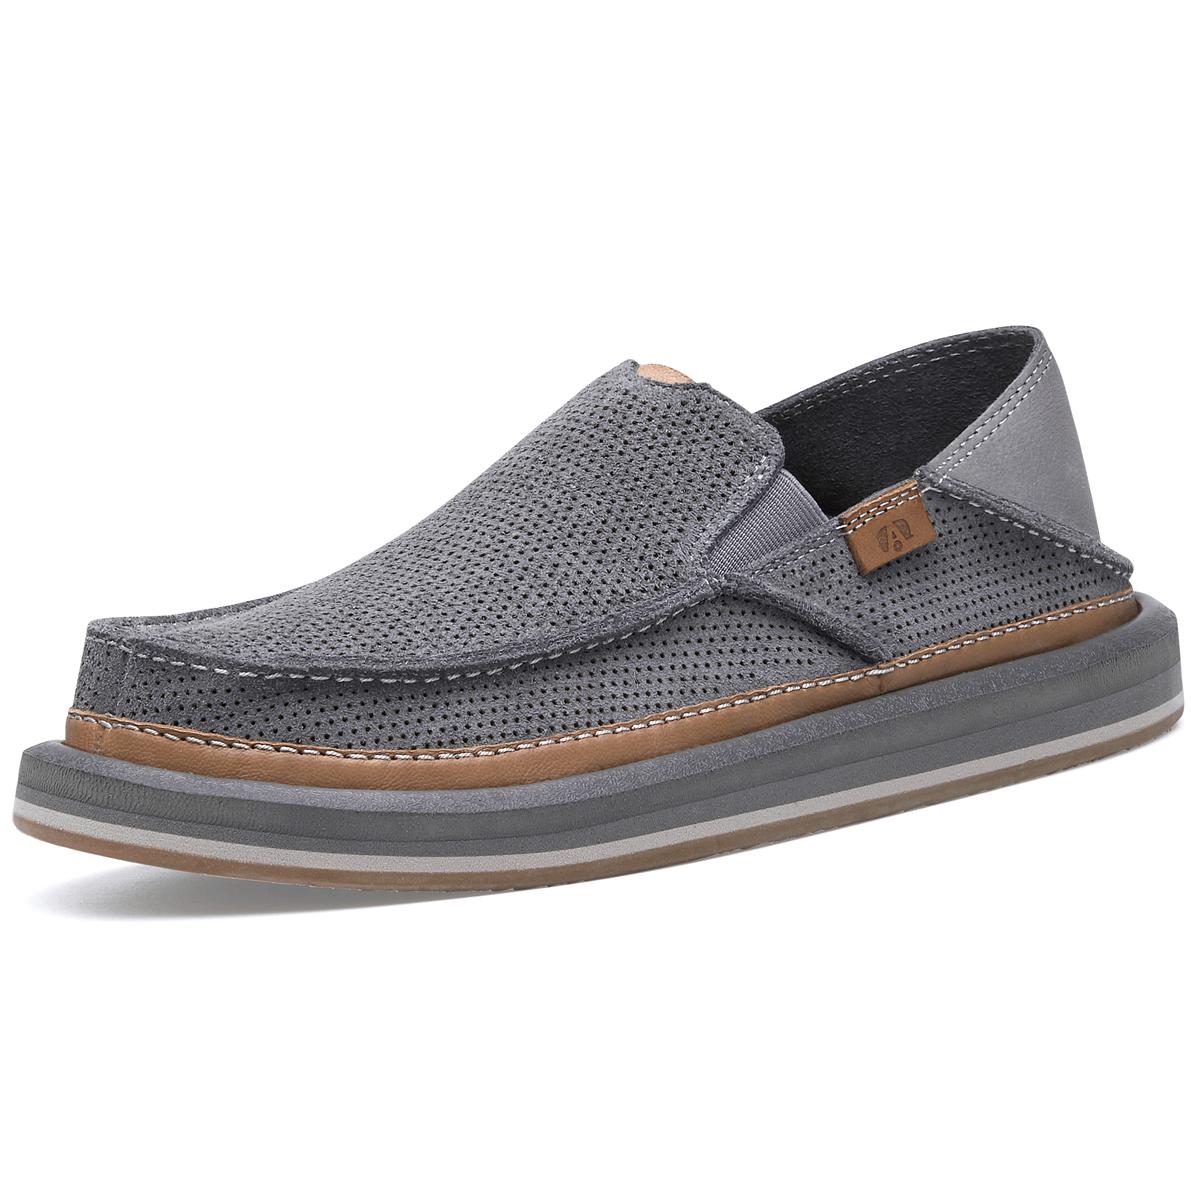 Sanuk-Shoe-Vagabond-St-X-Airstream-Leather-Grey-1